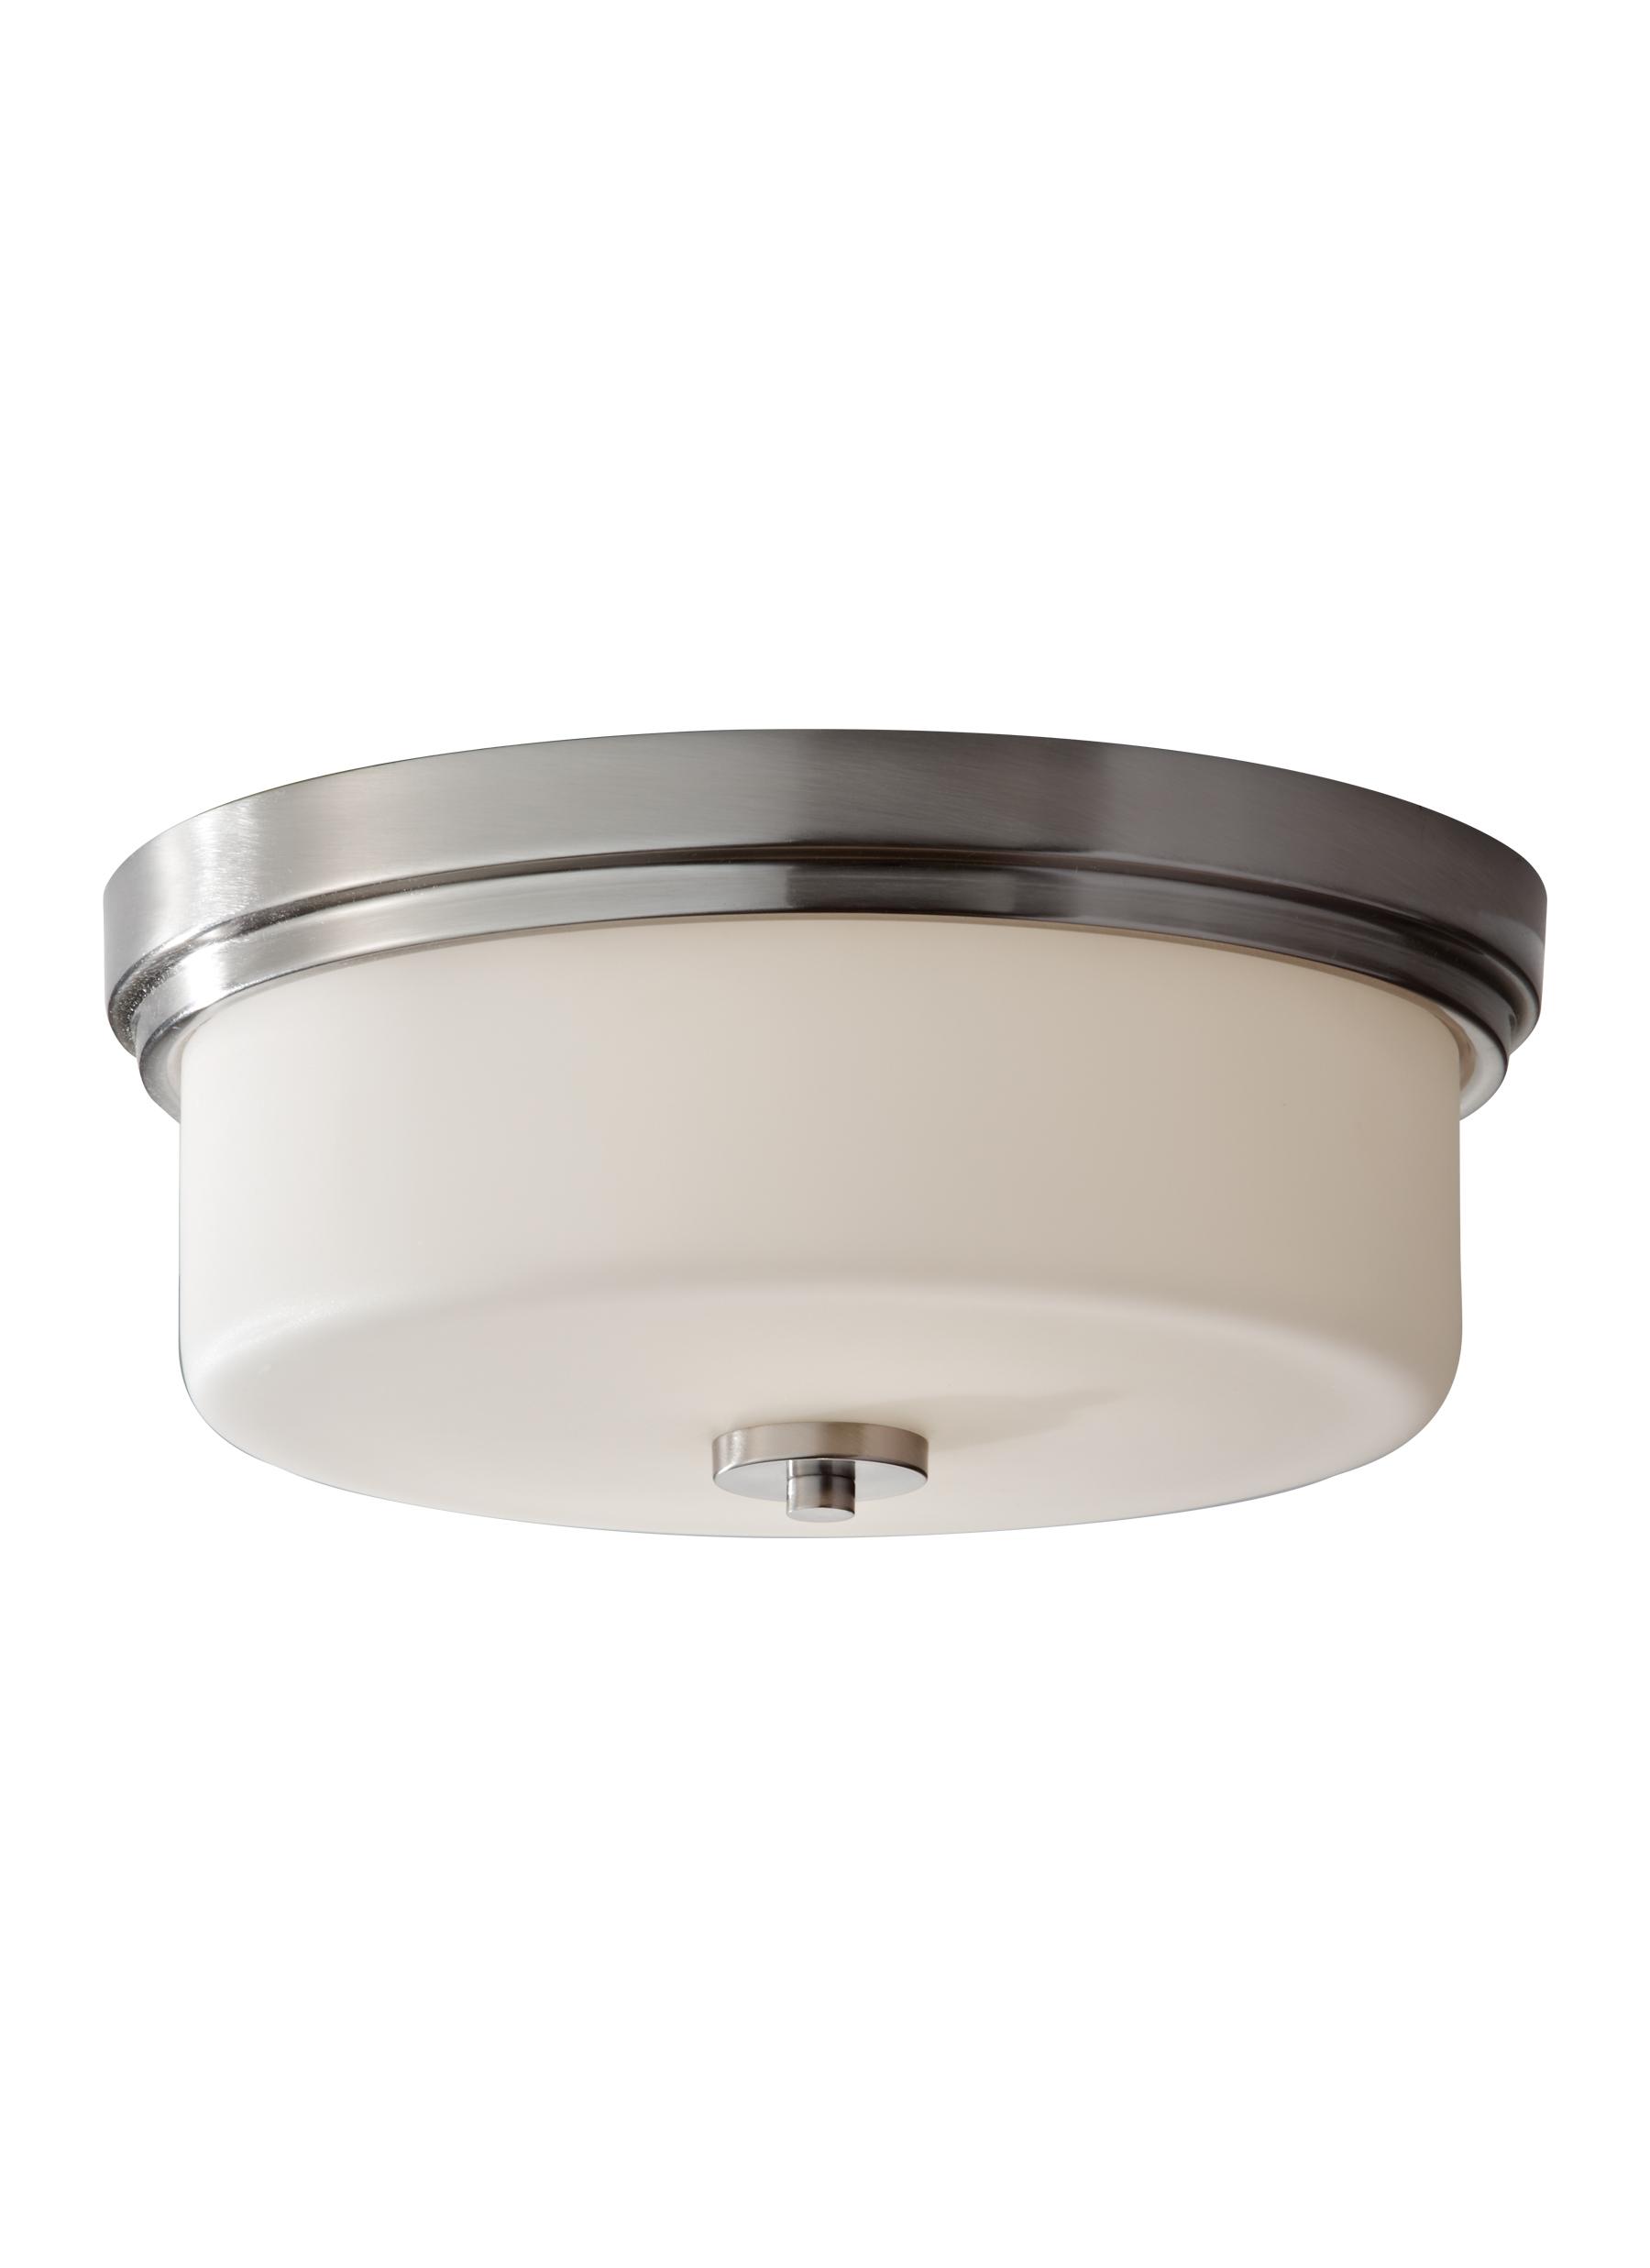 Fm370bs2 light indoor flush mount brushed steel loading zoom arubaitofo Gallery